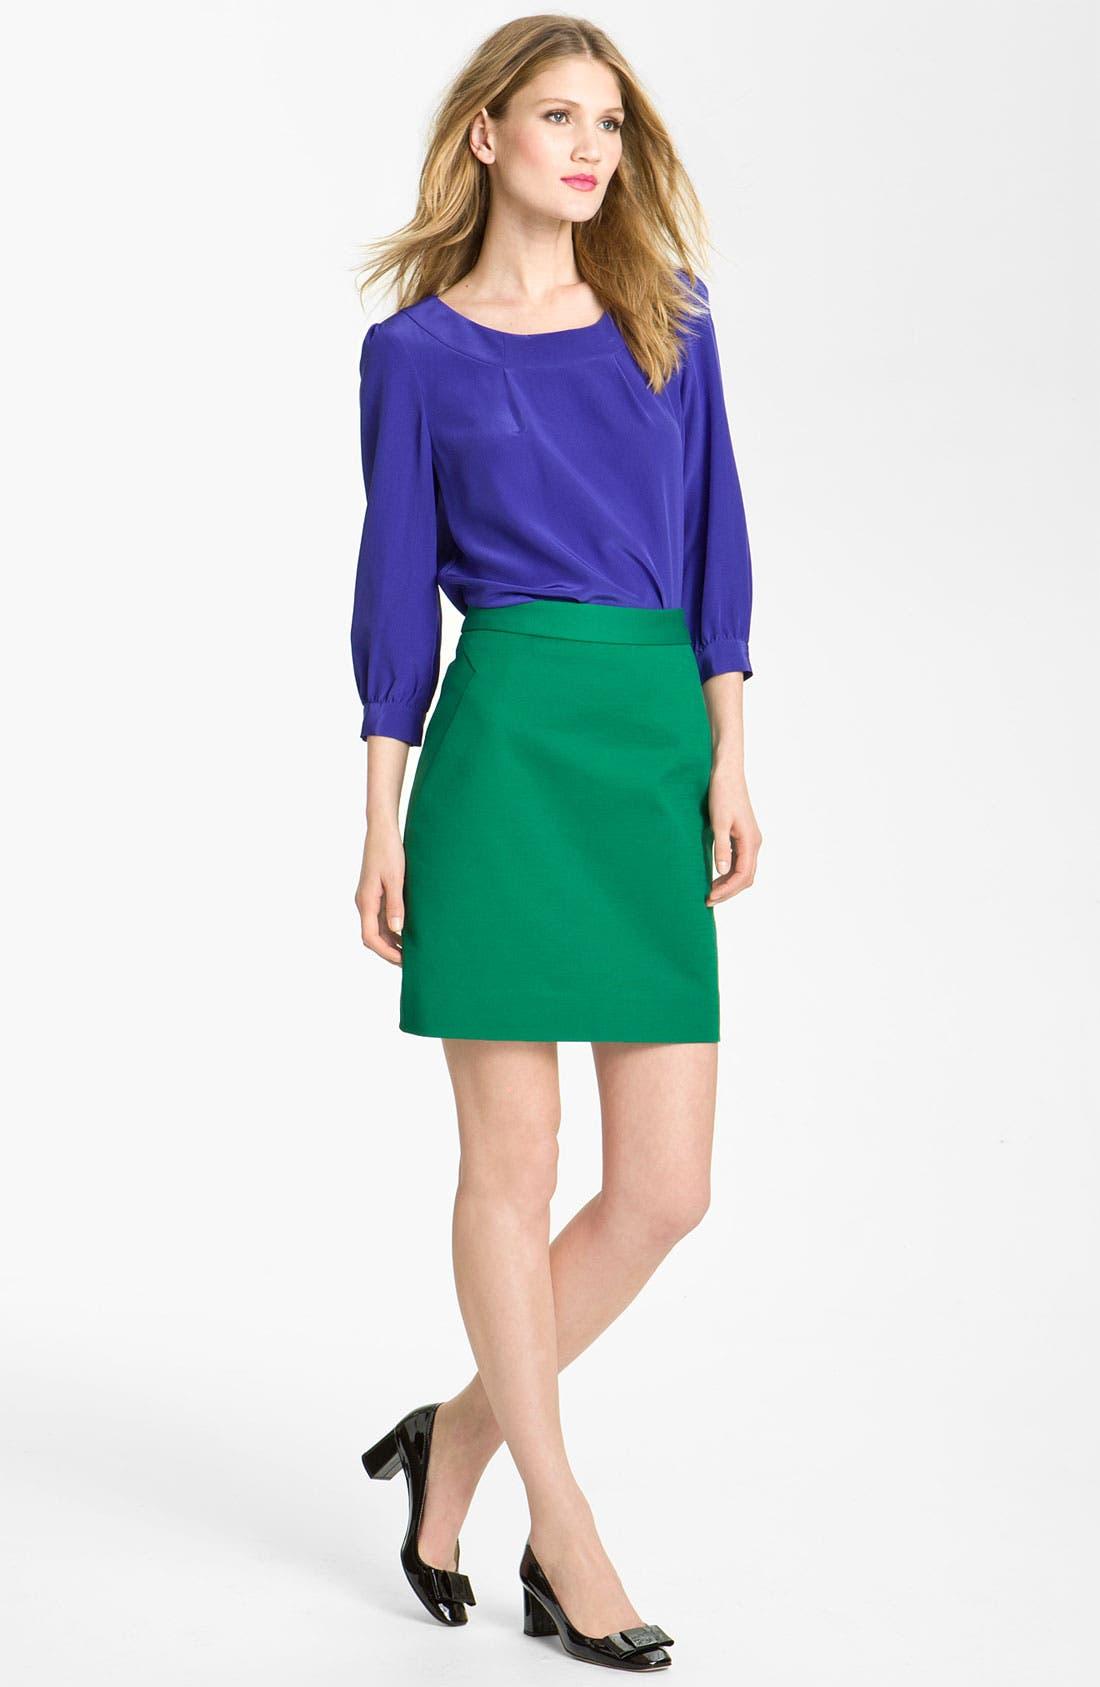 Alternate Image 1 Selected - kate spade new york 'bridgette' blouse